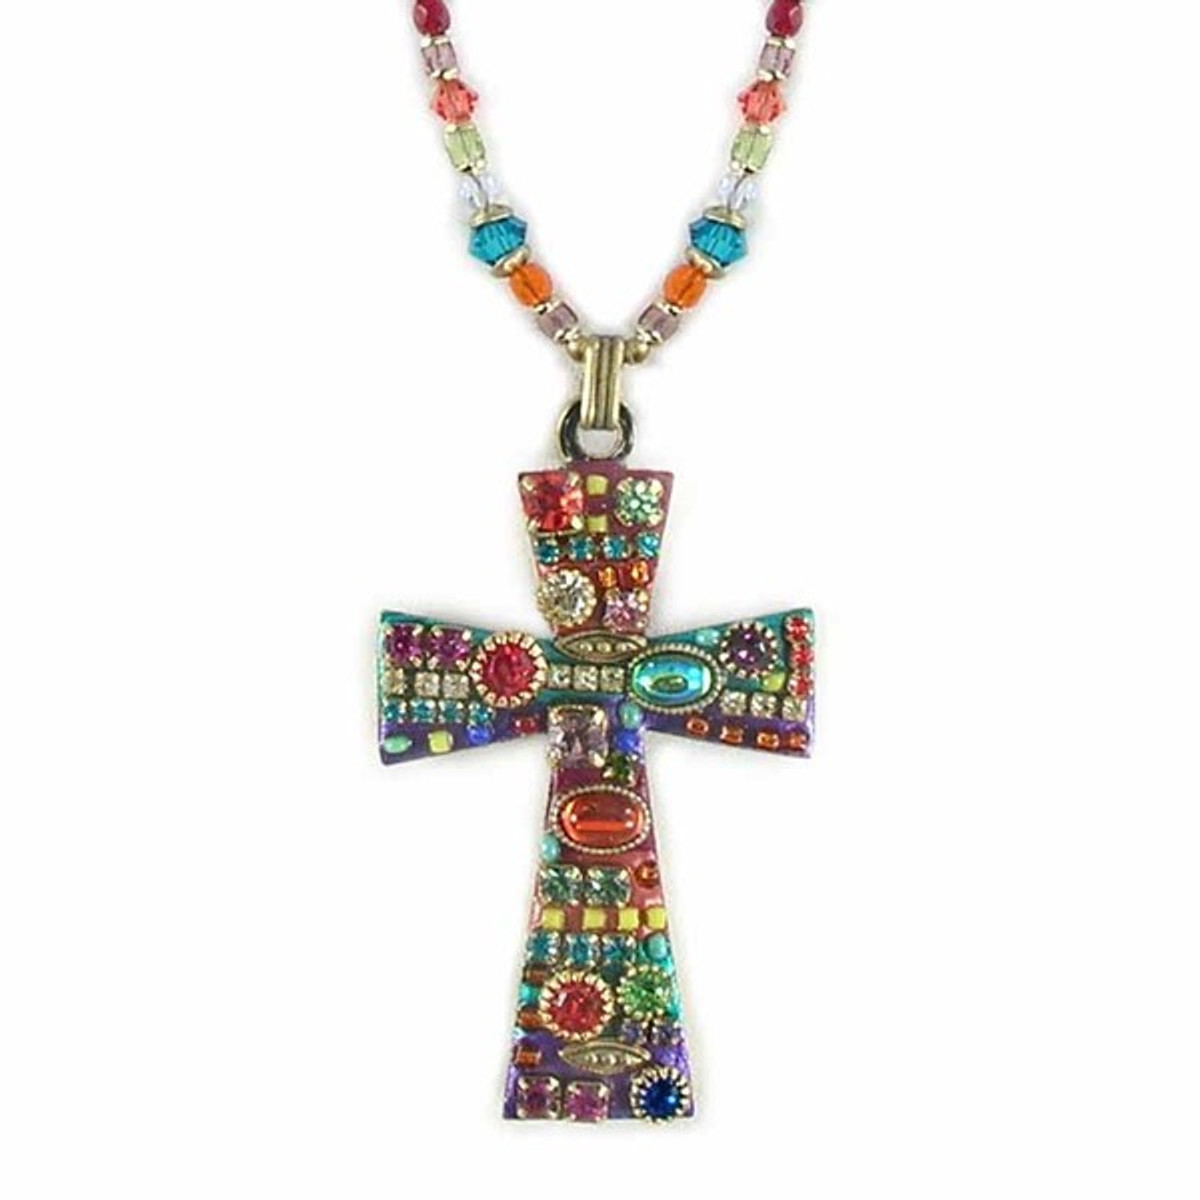 Michal Golan Multibright Cross Necklace